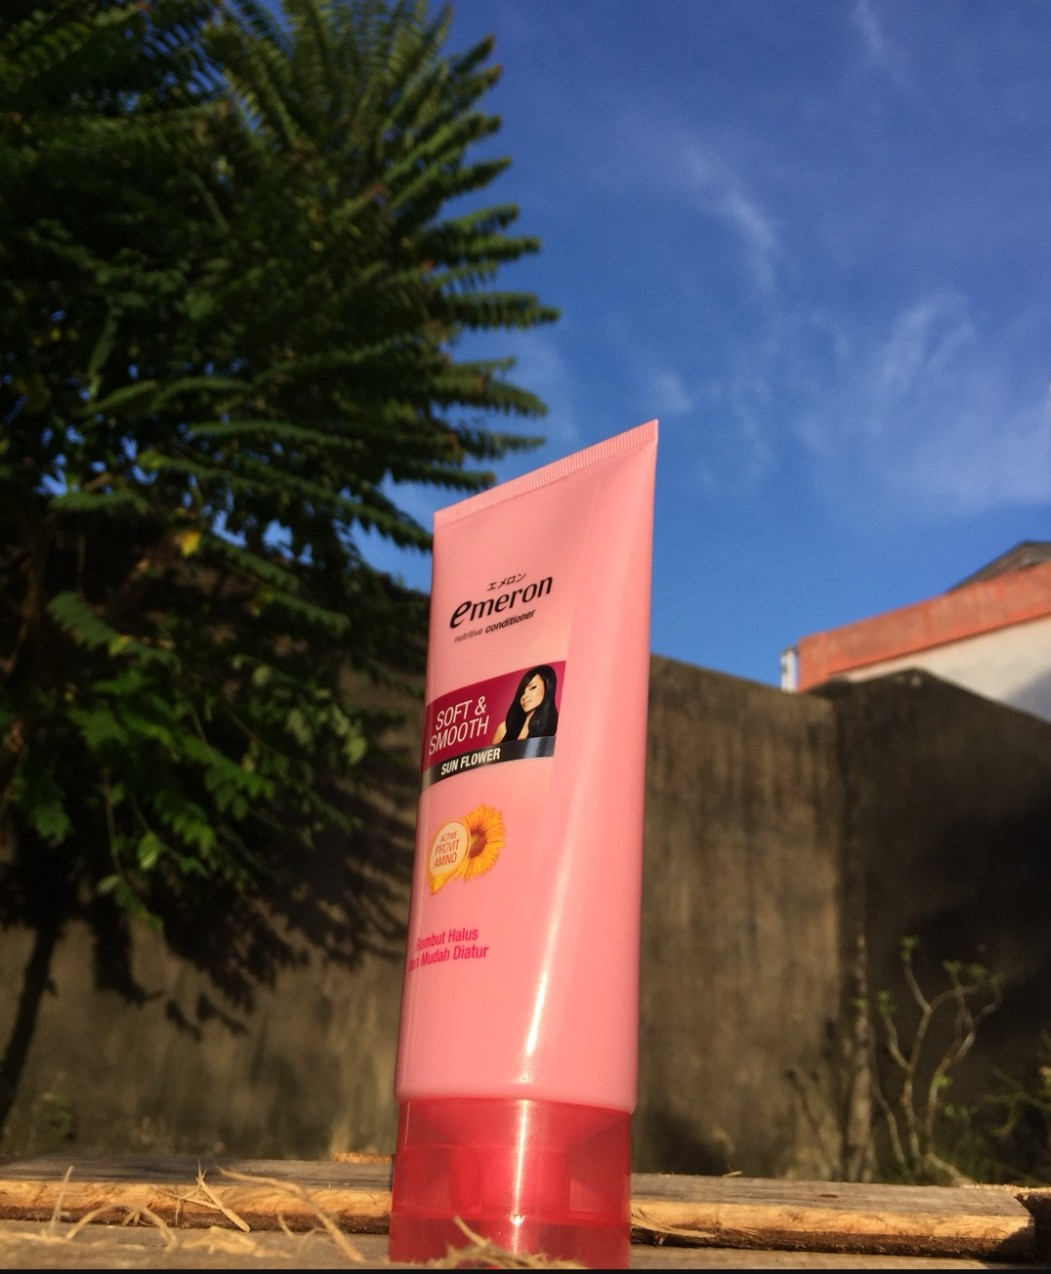 Emeron Soft & Smooth Conditioner